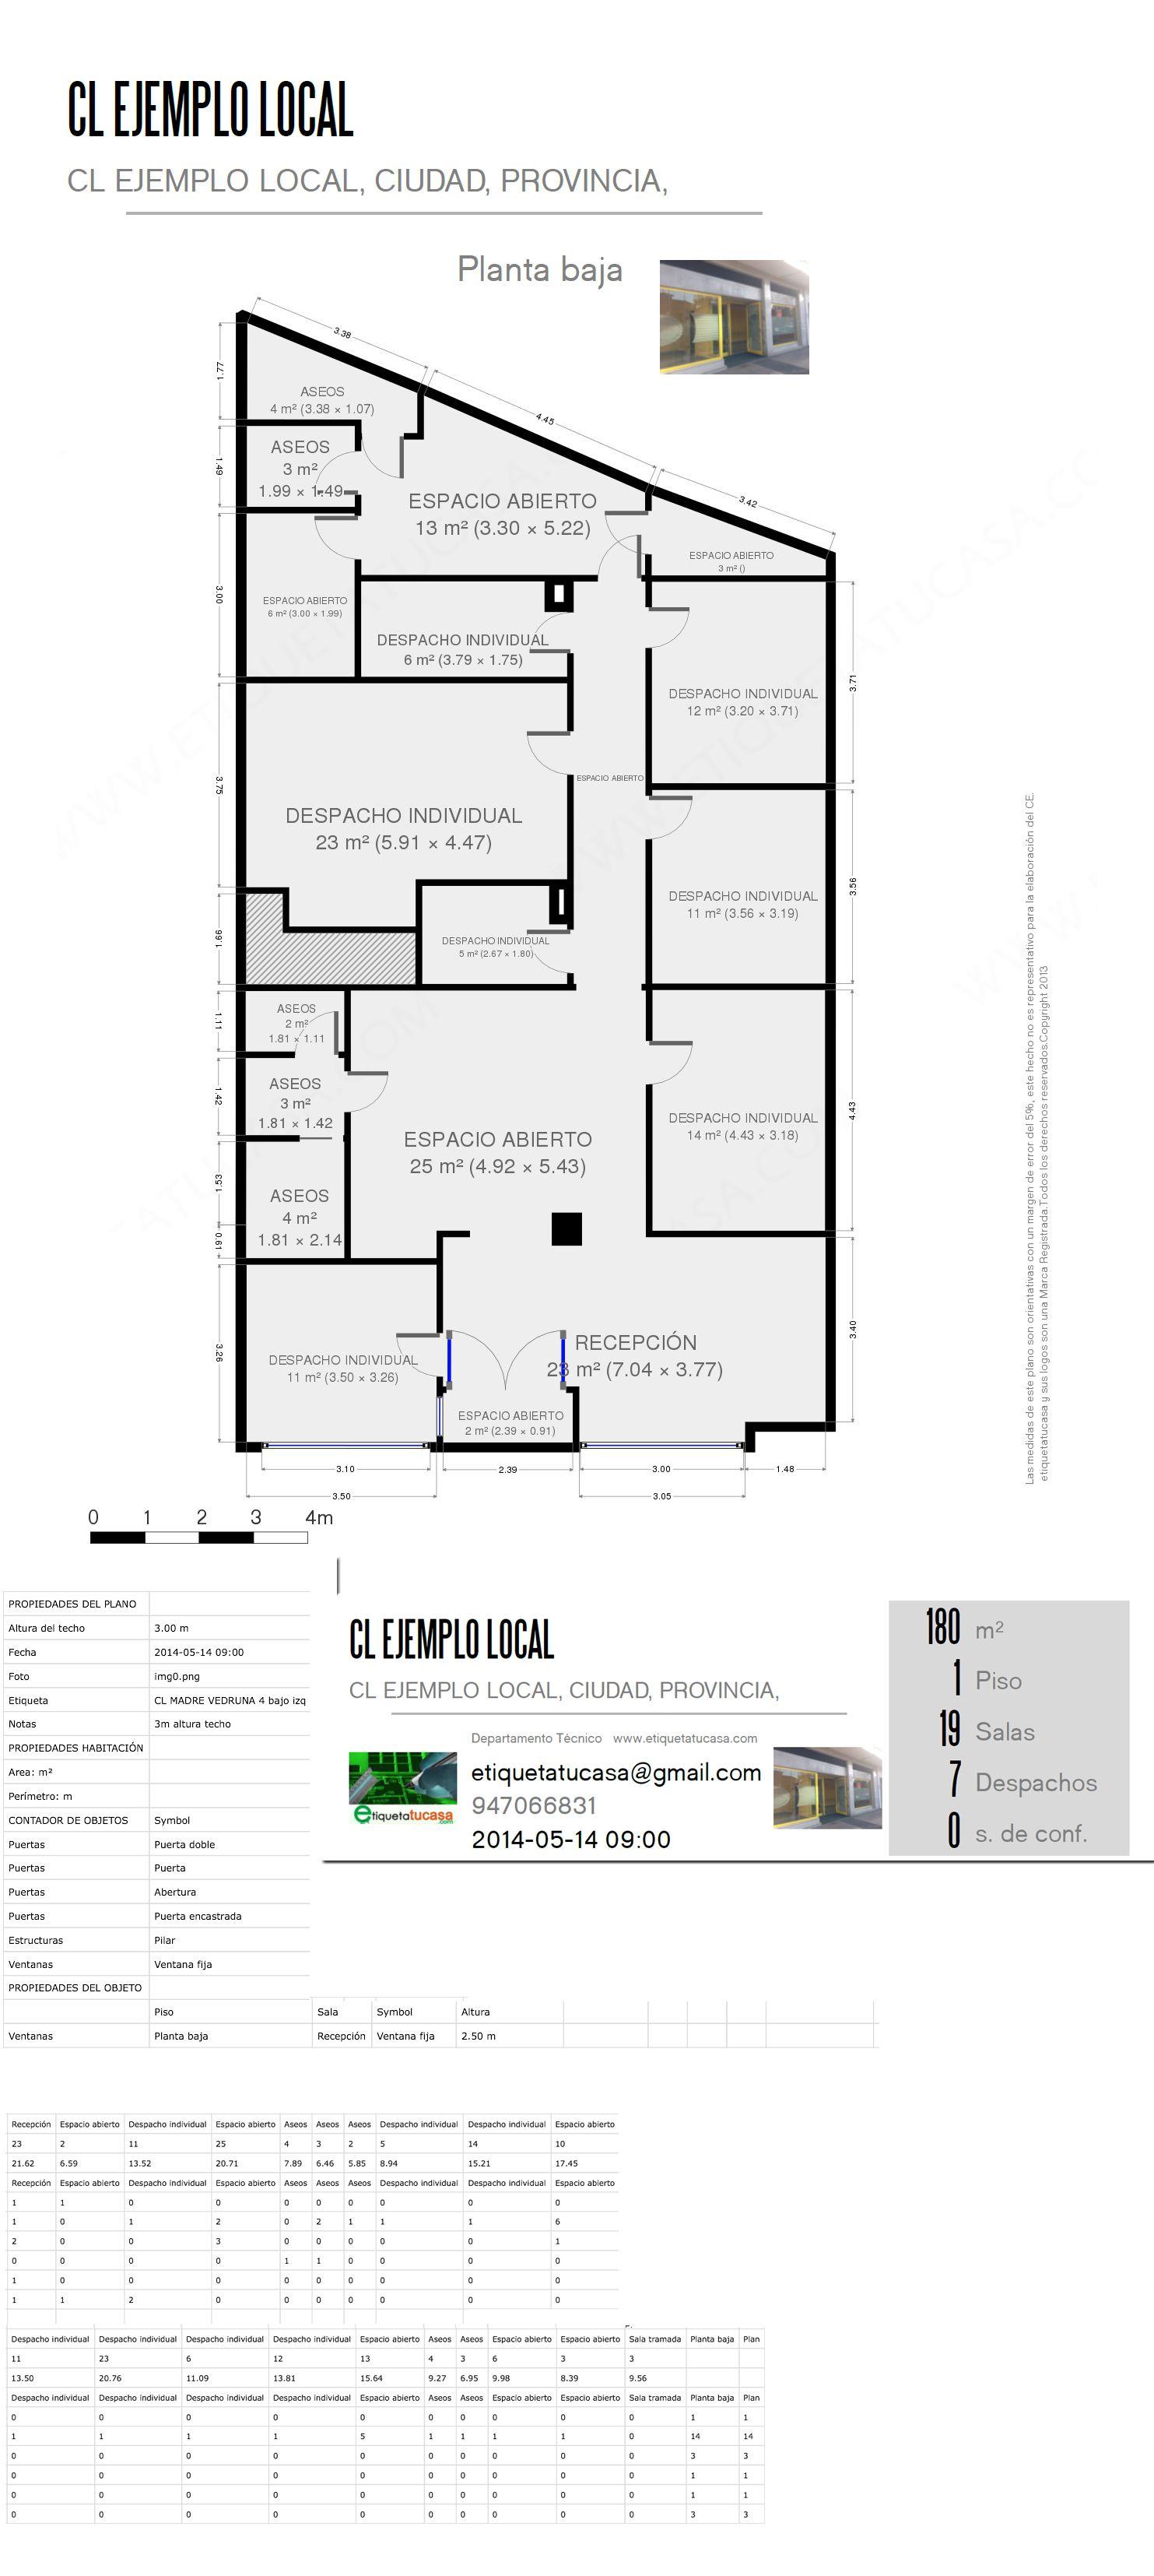 plano de local comercial ejemplo | Casas | Pinterest